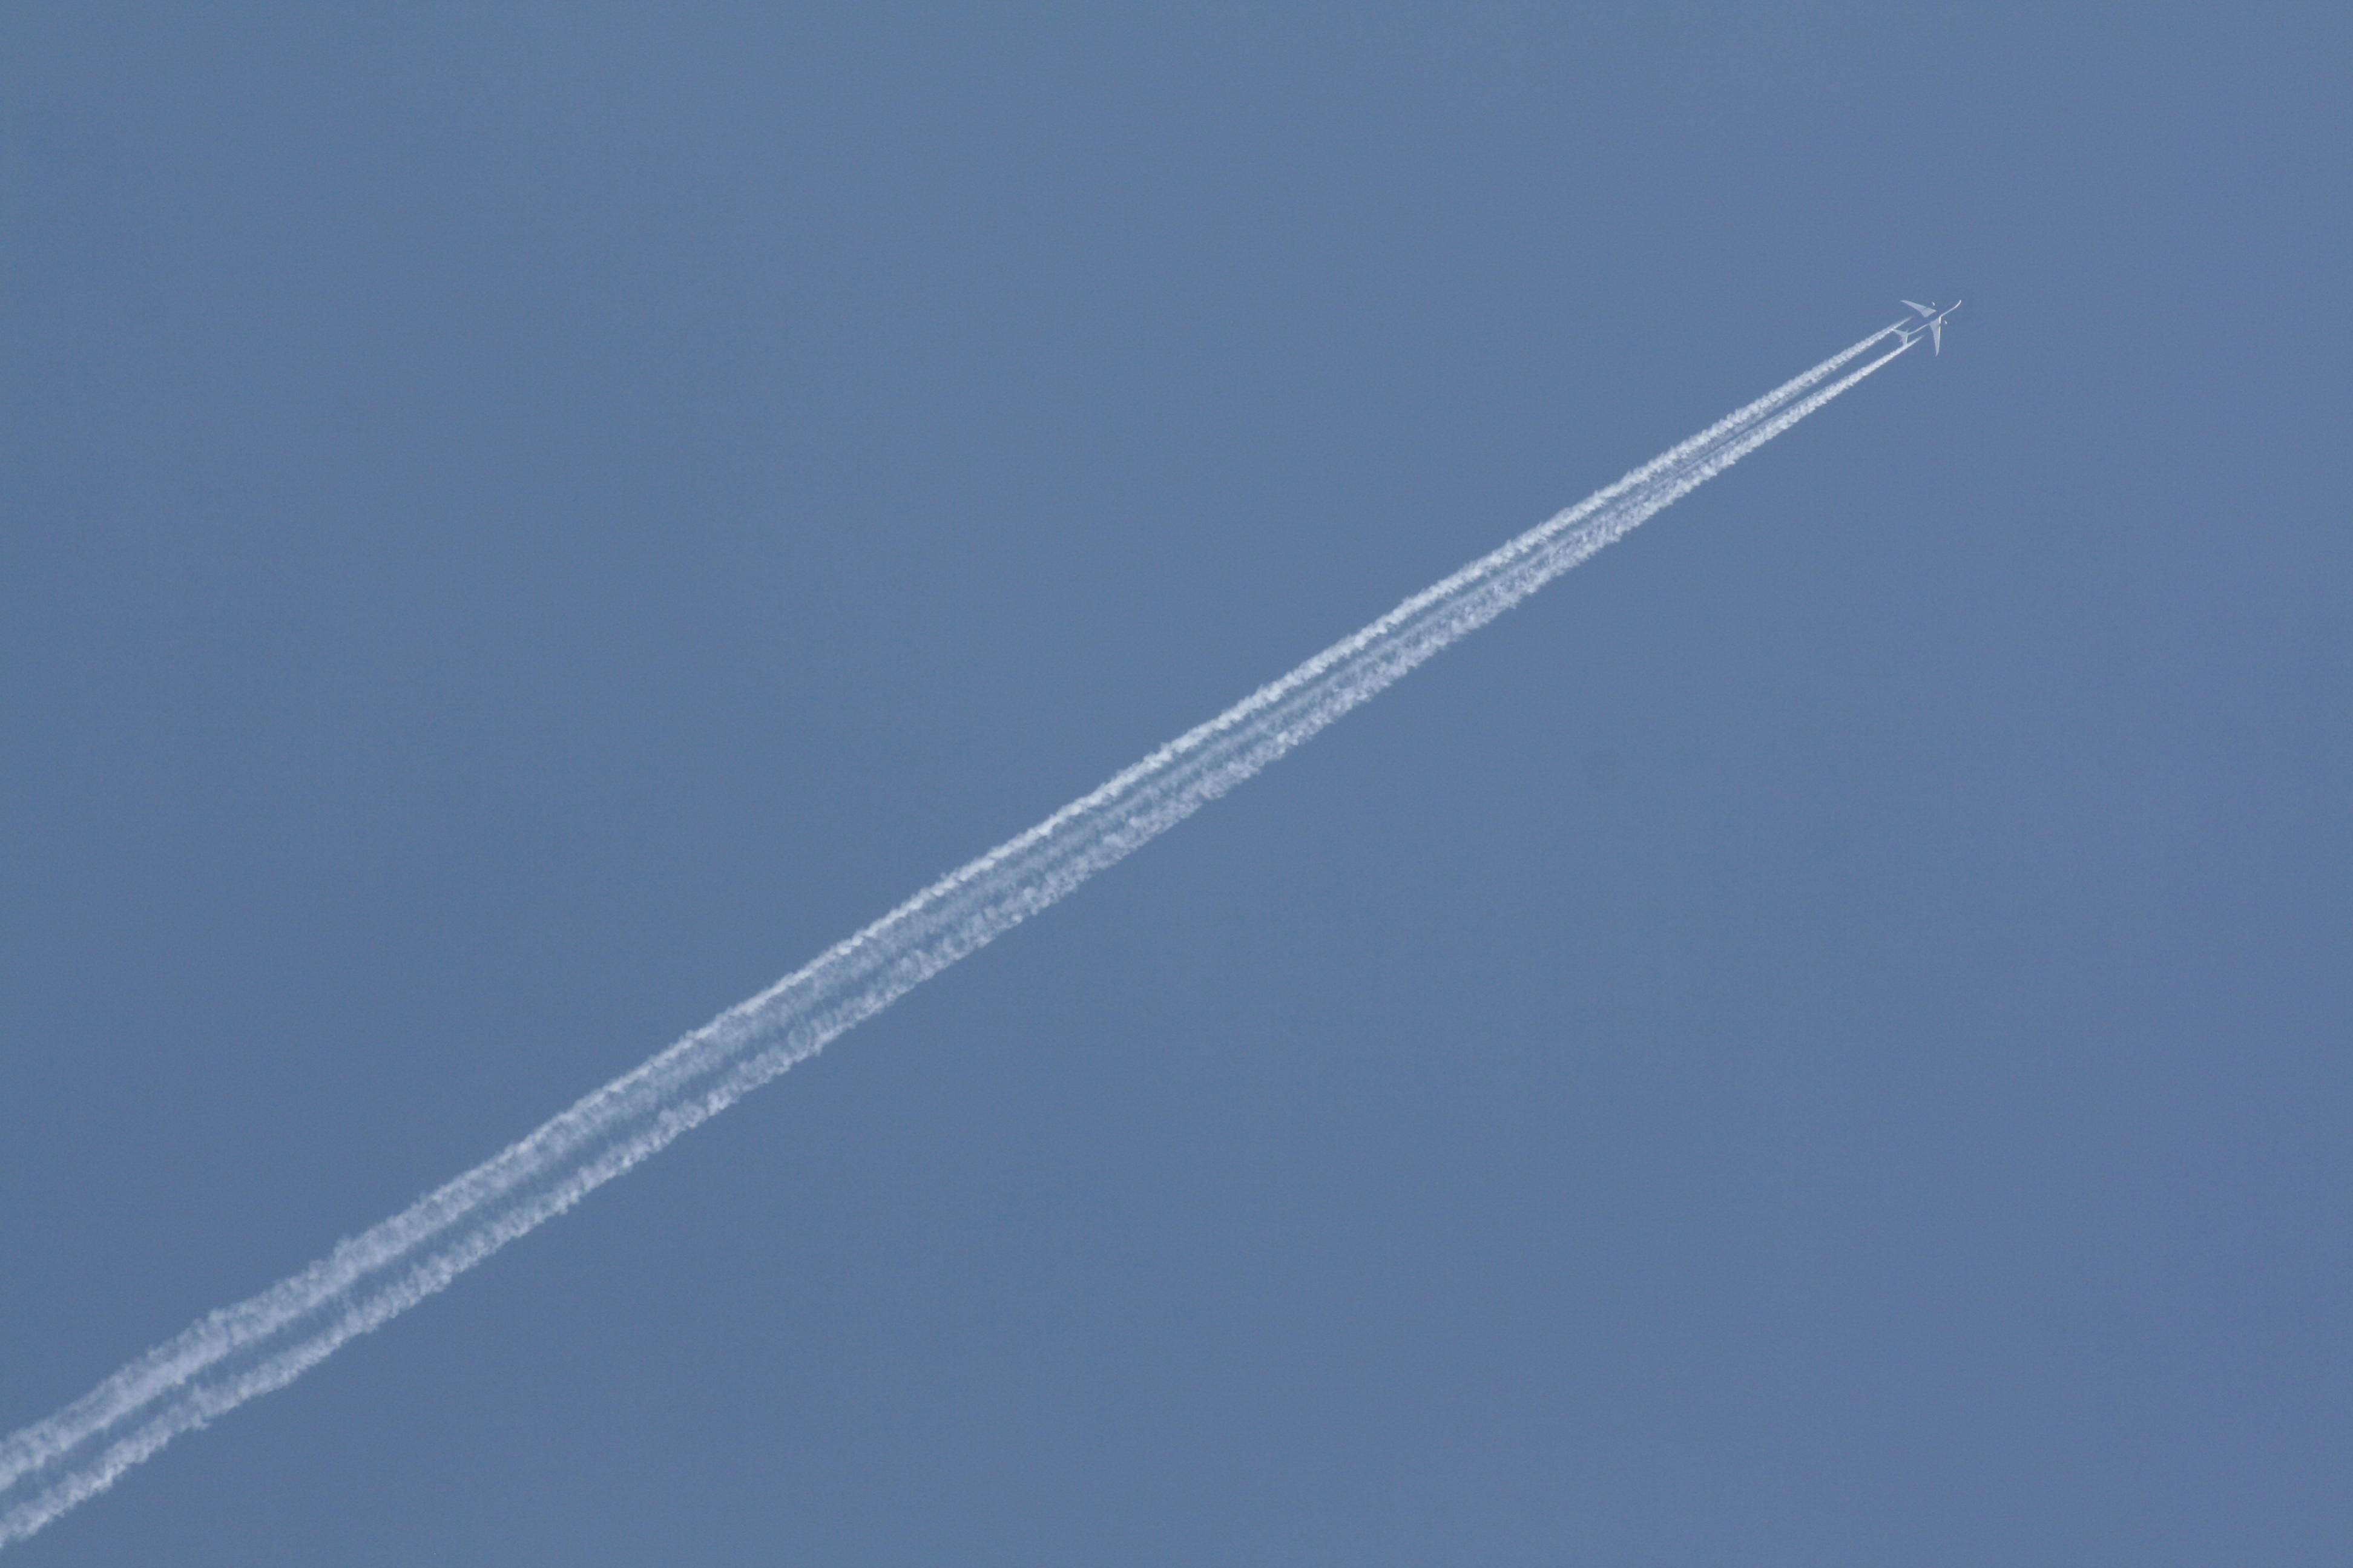 Naam: Boeing backgarden.jpg Bekeken: 543 Grootte: 391,7 KB